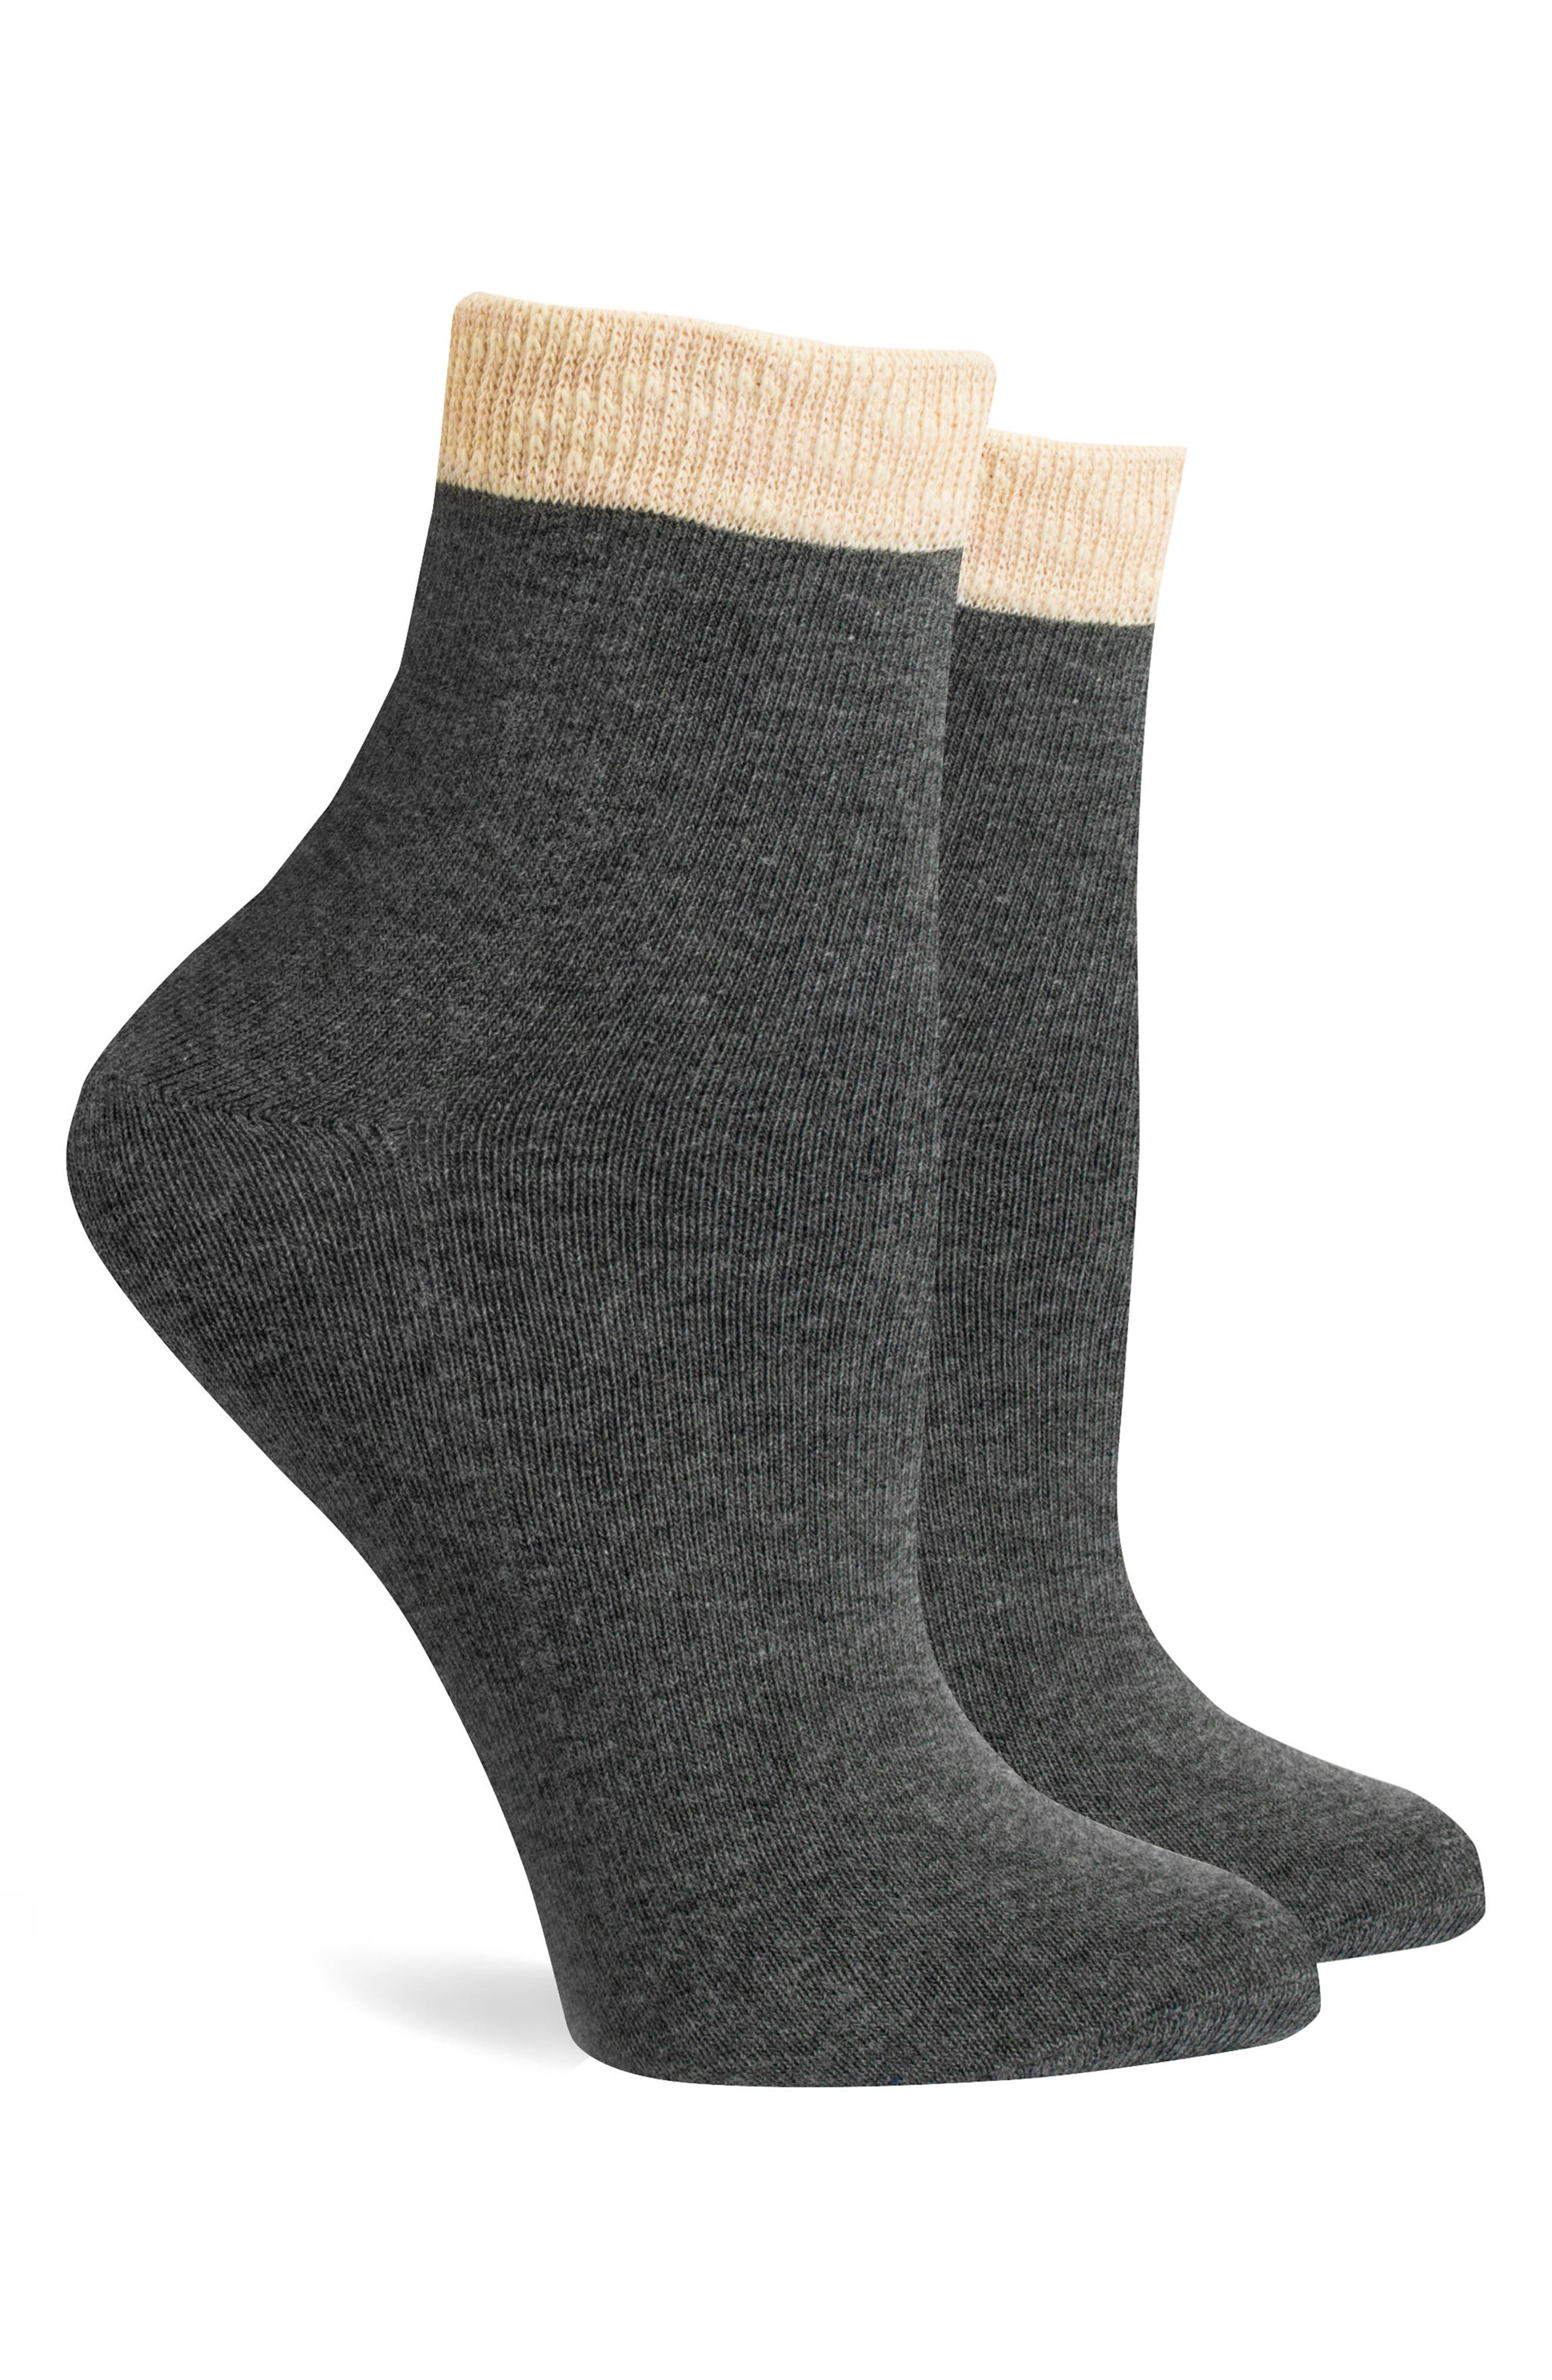 Ivy Ankle Socks,                             Alternate thumbnail 2, color,